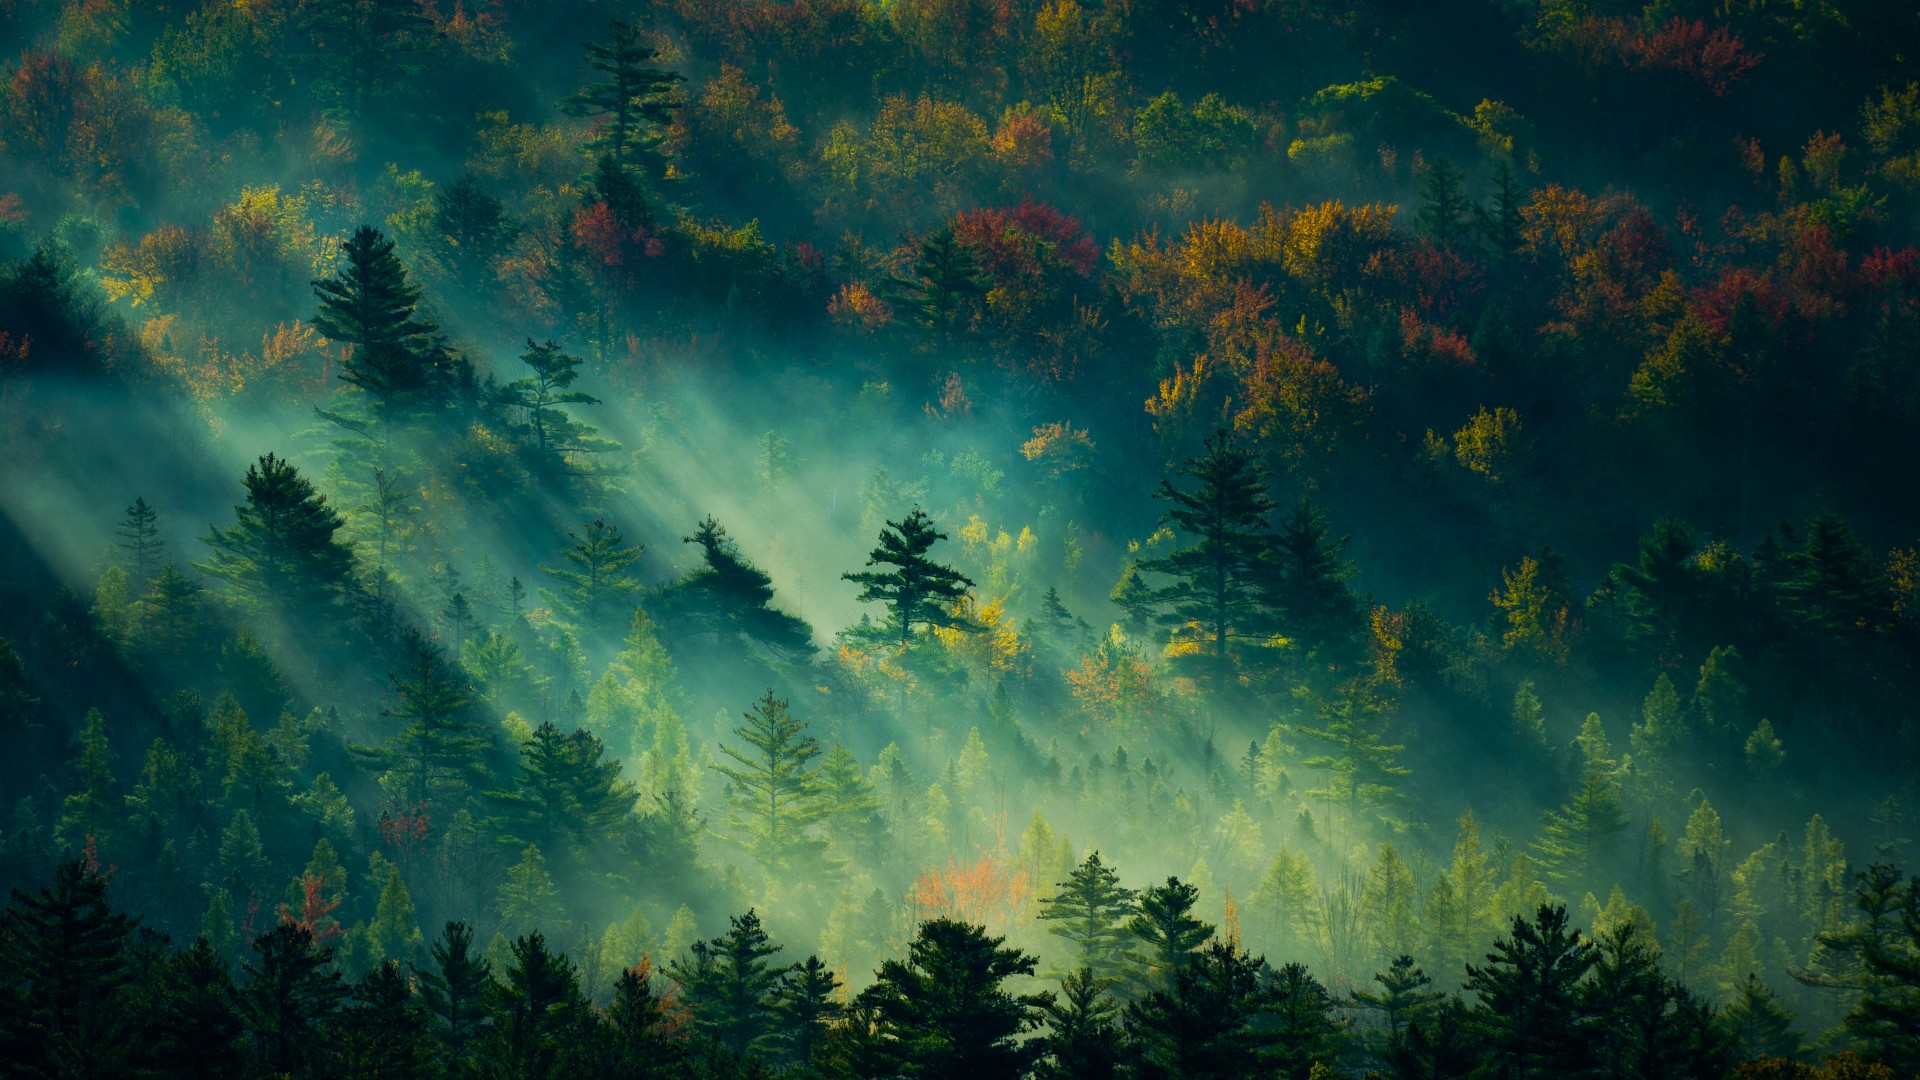 Wallpaper Trees Light Green 4k Nature 19568